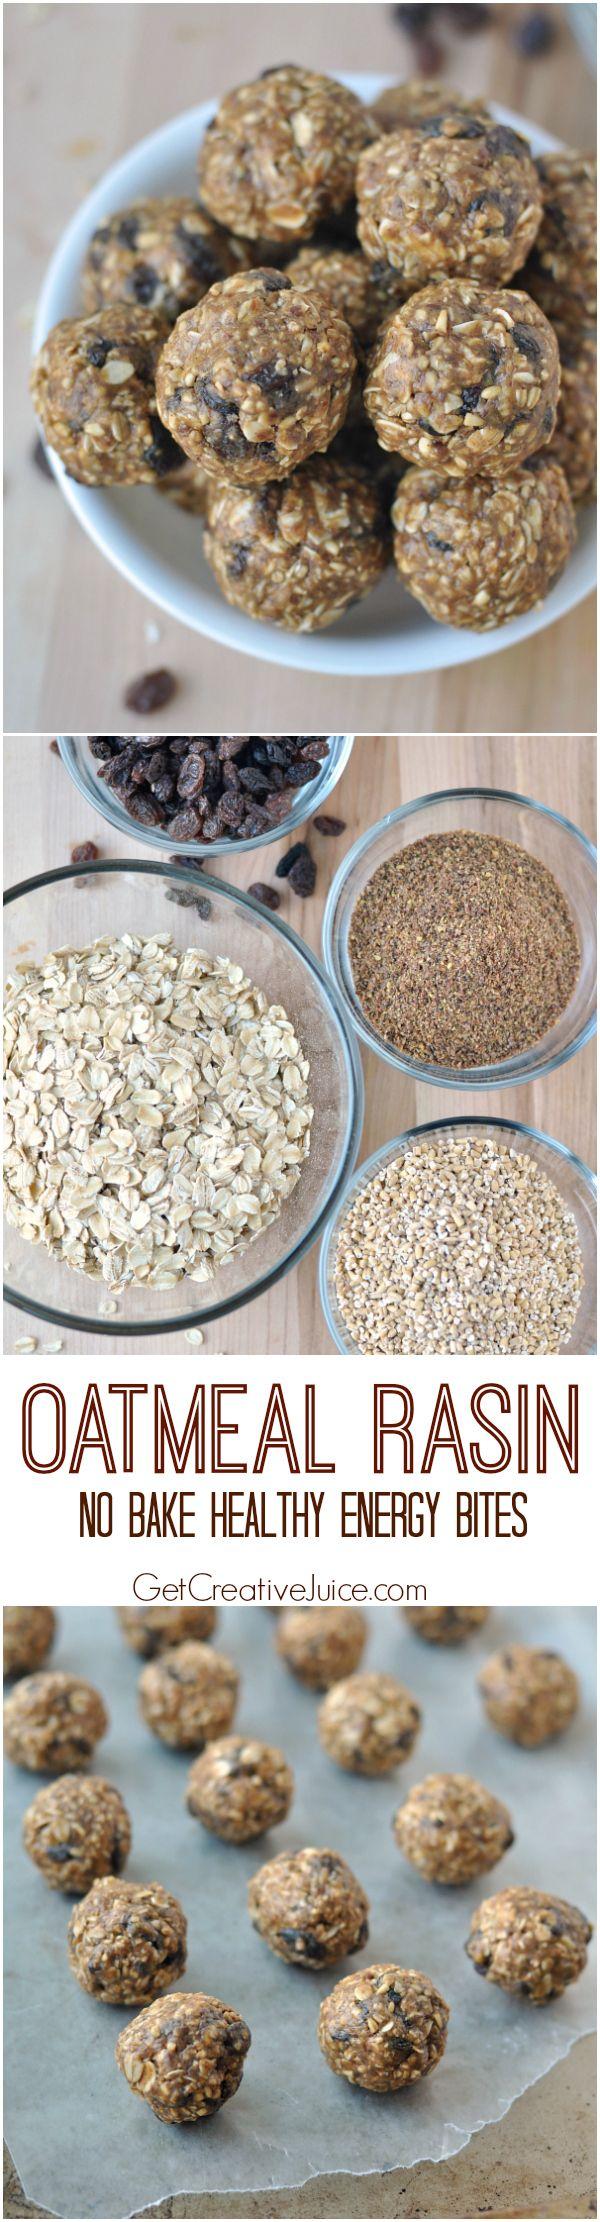 Oatmeal raisin no bake healthy energy bite snack recipe